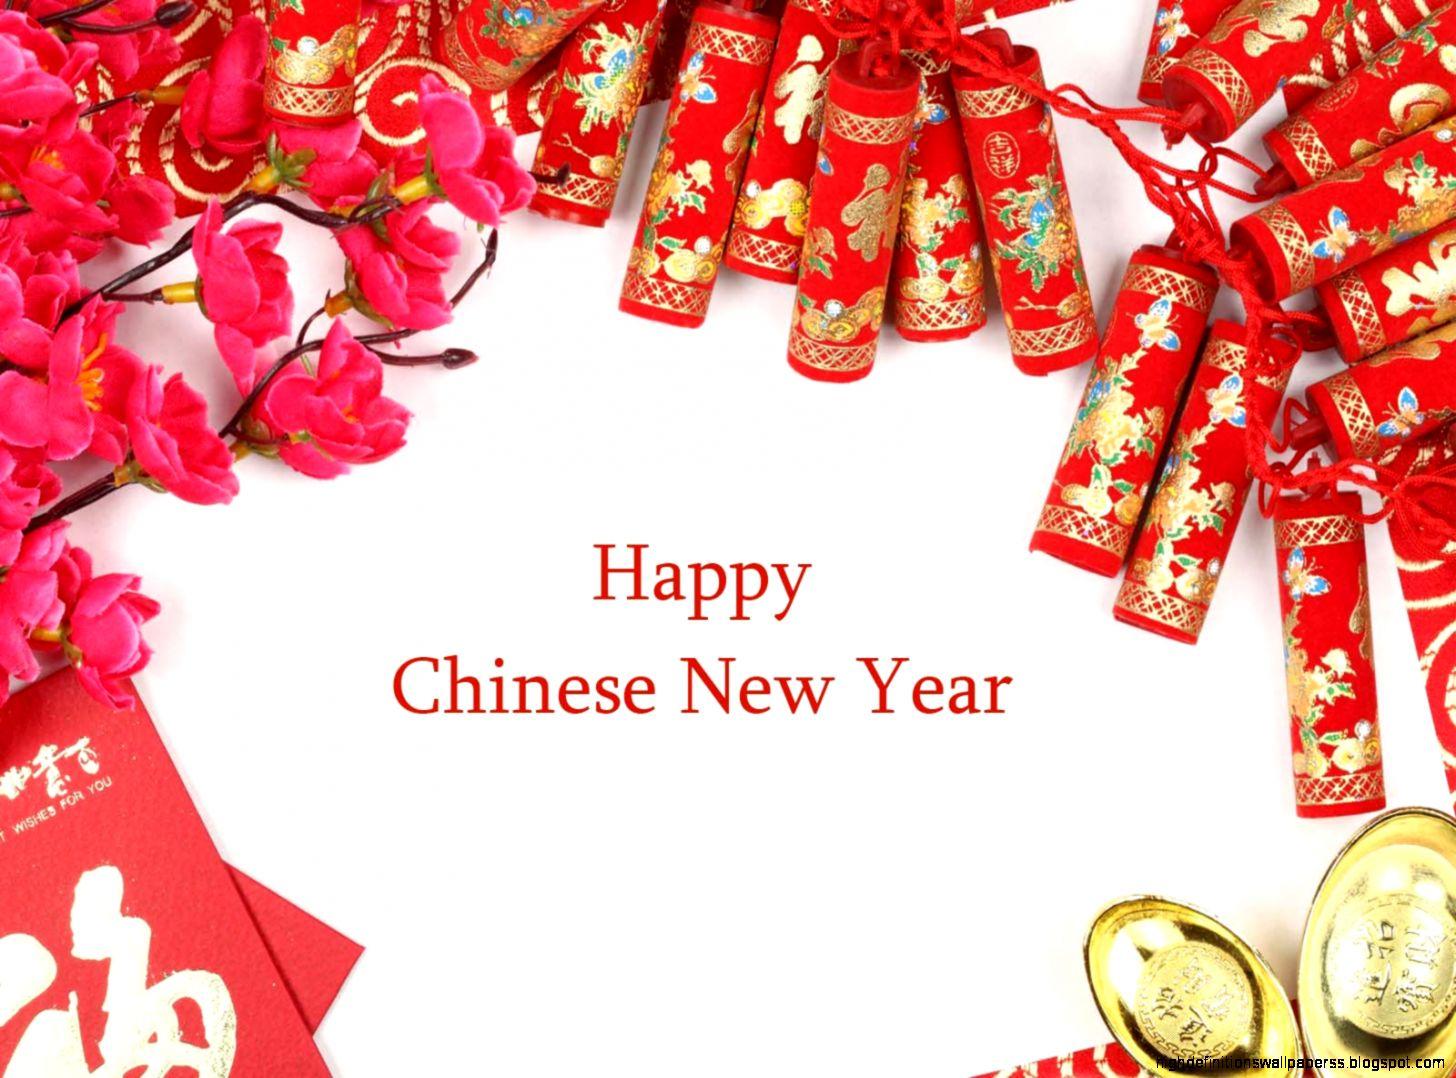 view original size happy chinese new year 2015 wallpaper 15315 wallpaper wallpaperlepi